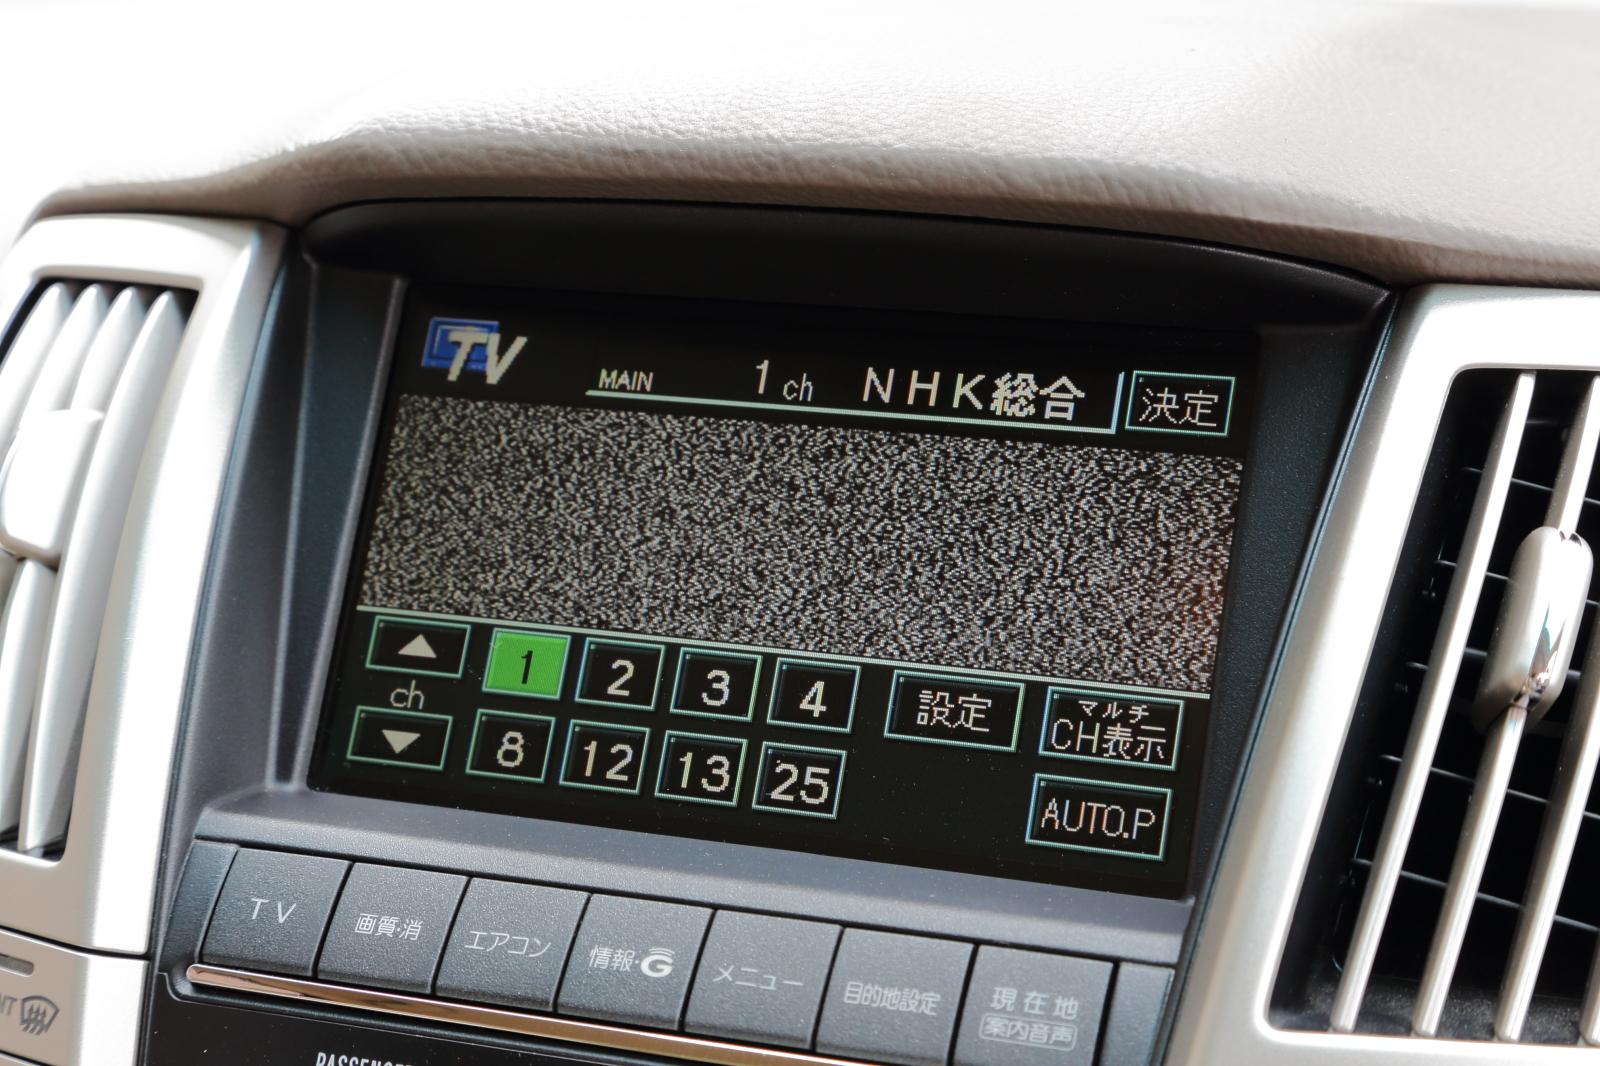 VTRアダプター取り付け前のTV画面